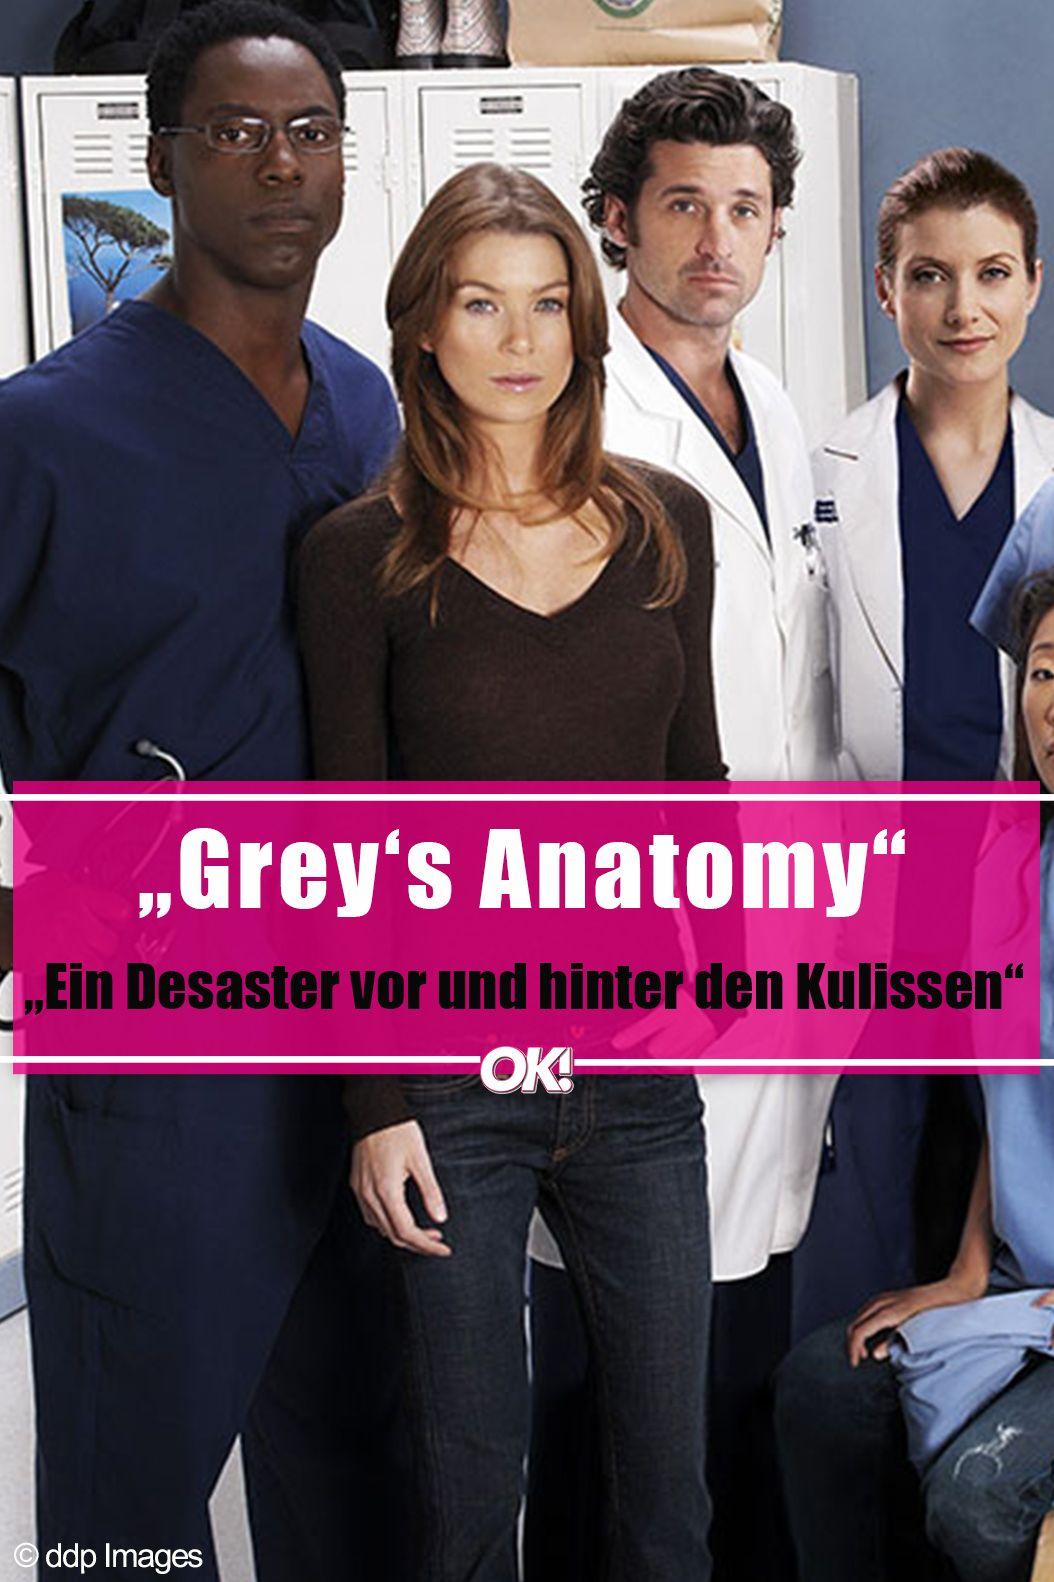 GreyS Anatomy Hinter Den Kulissen